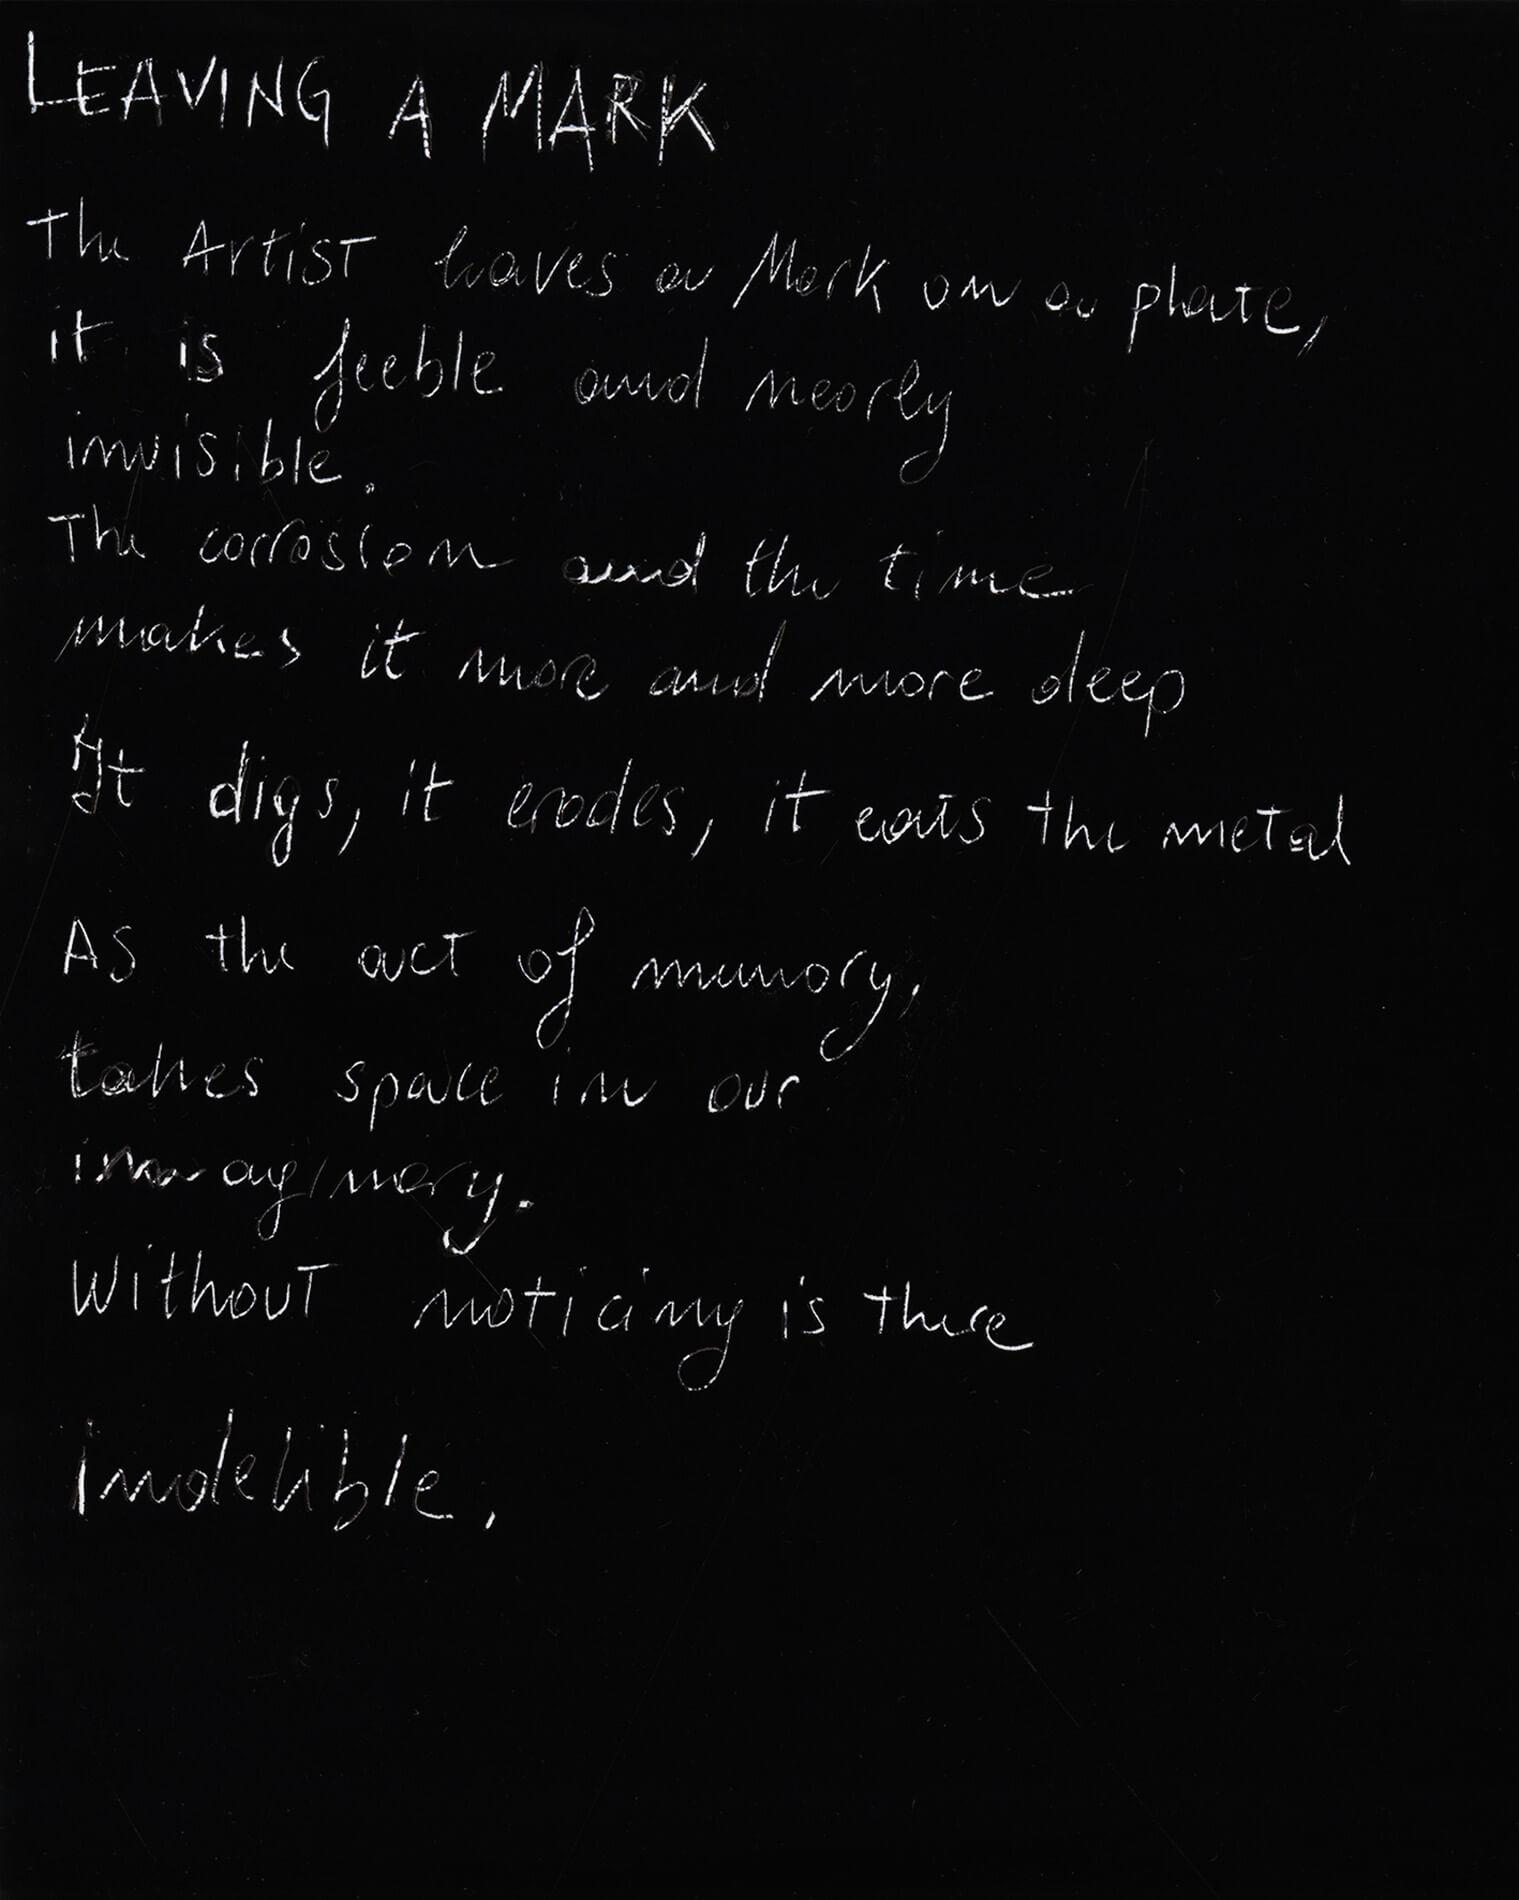 white handwriting on black background